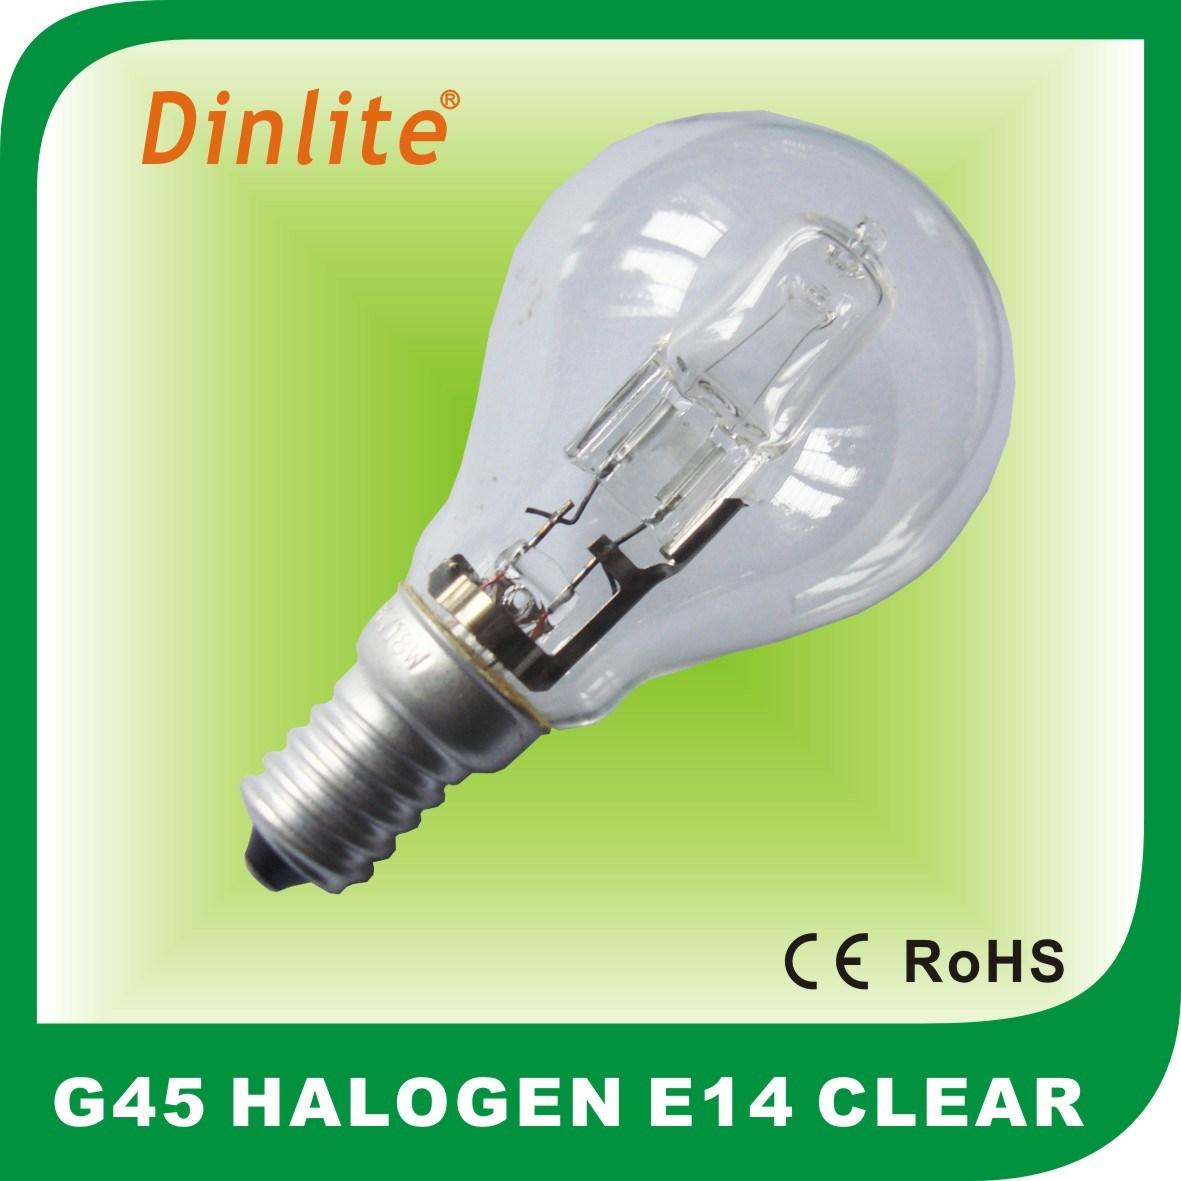 Hot sell G45 E14 ECO halogen bulb